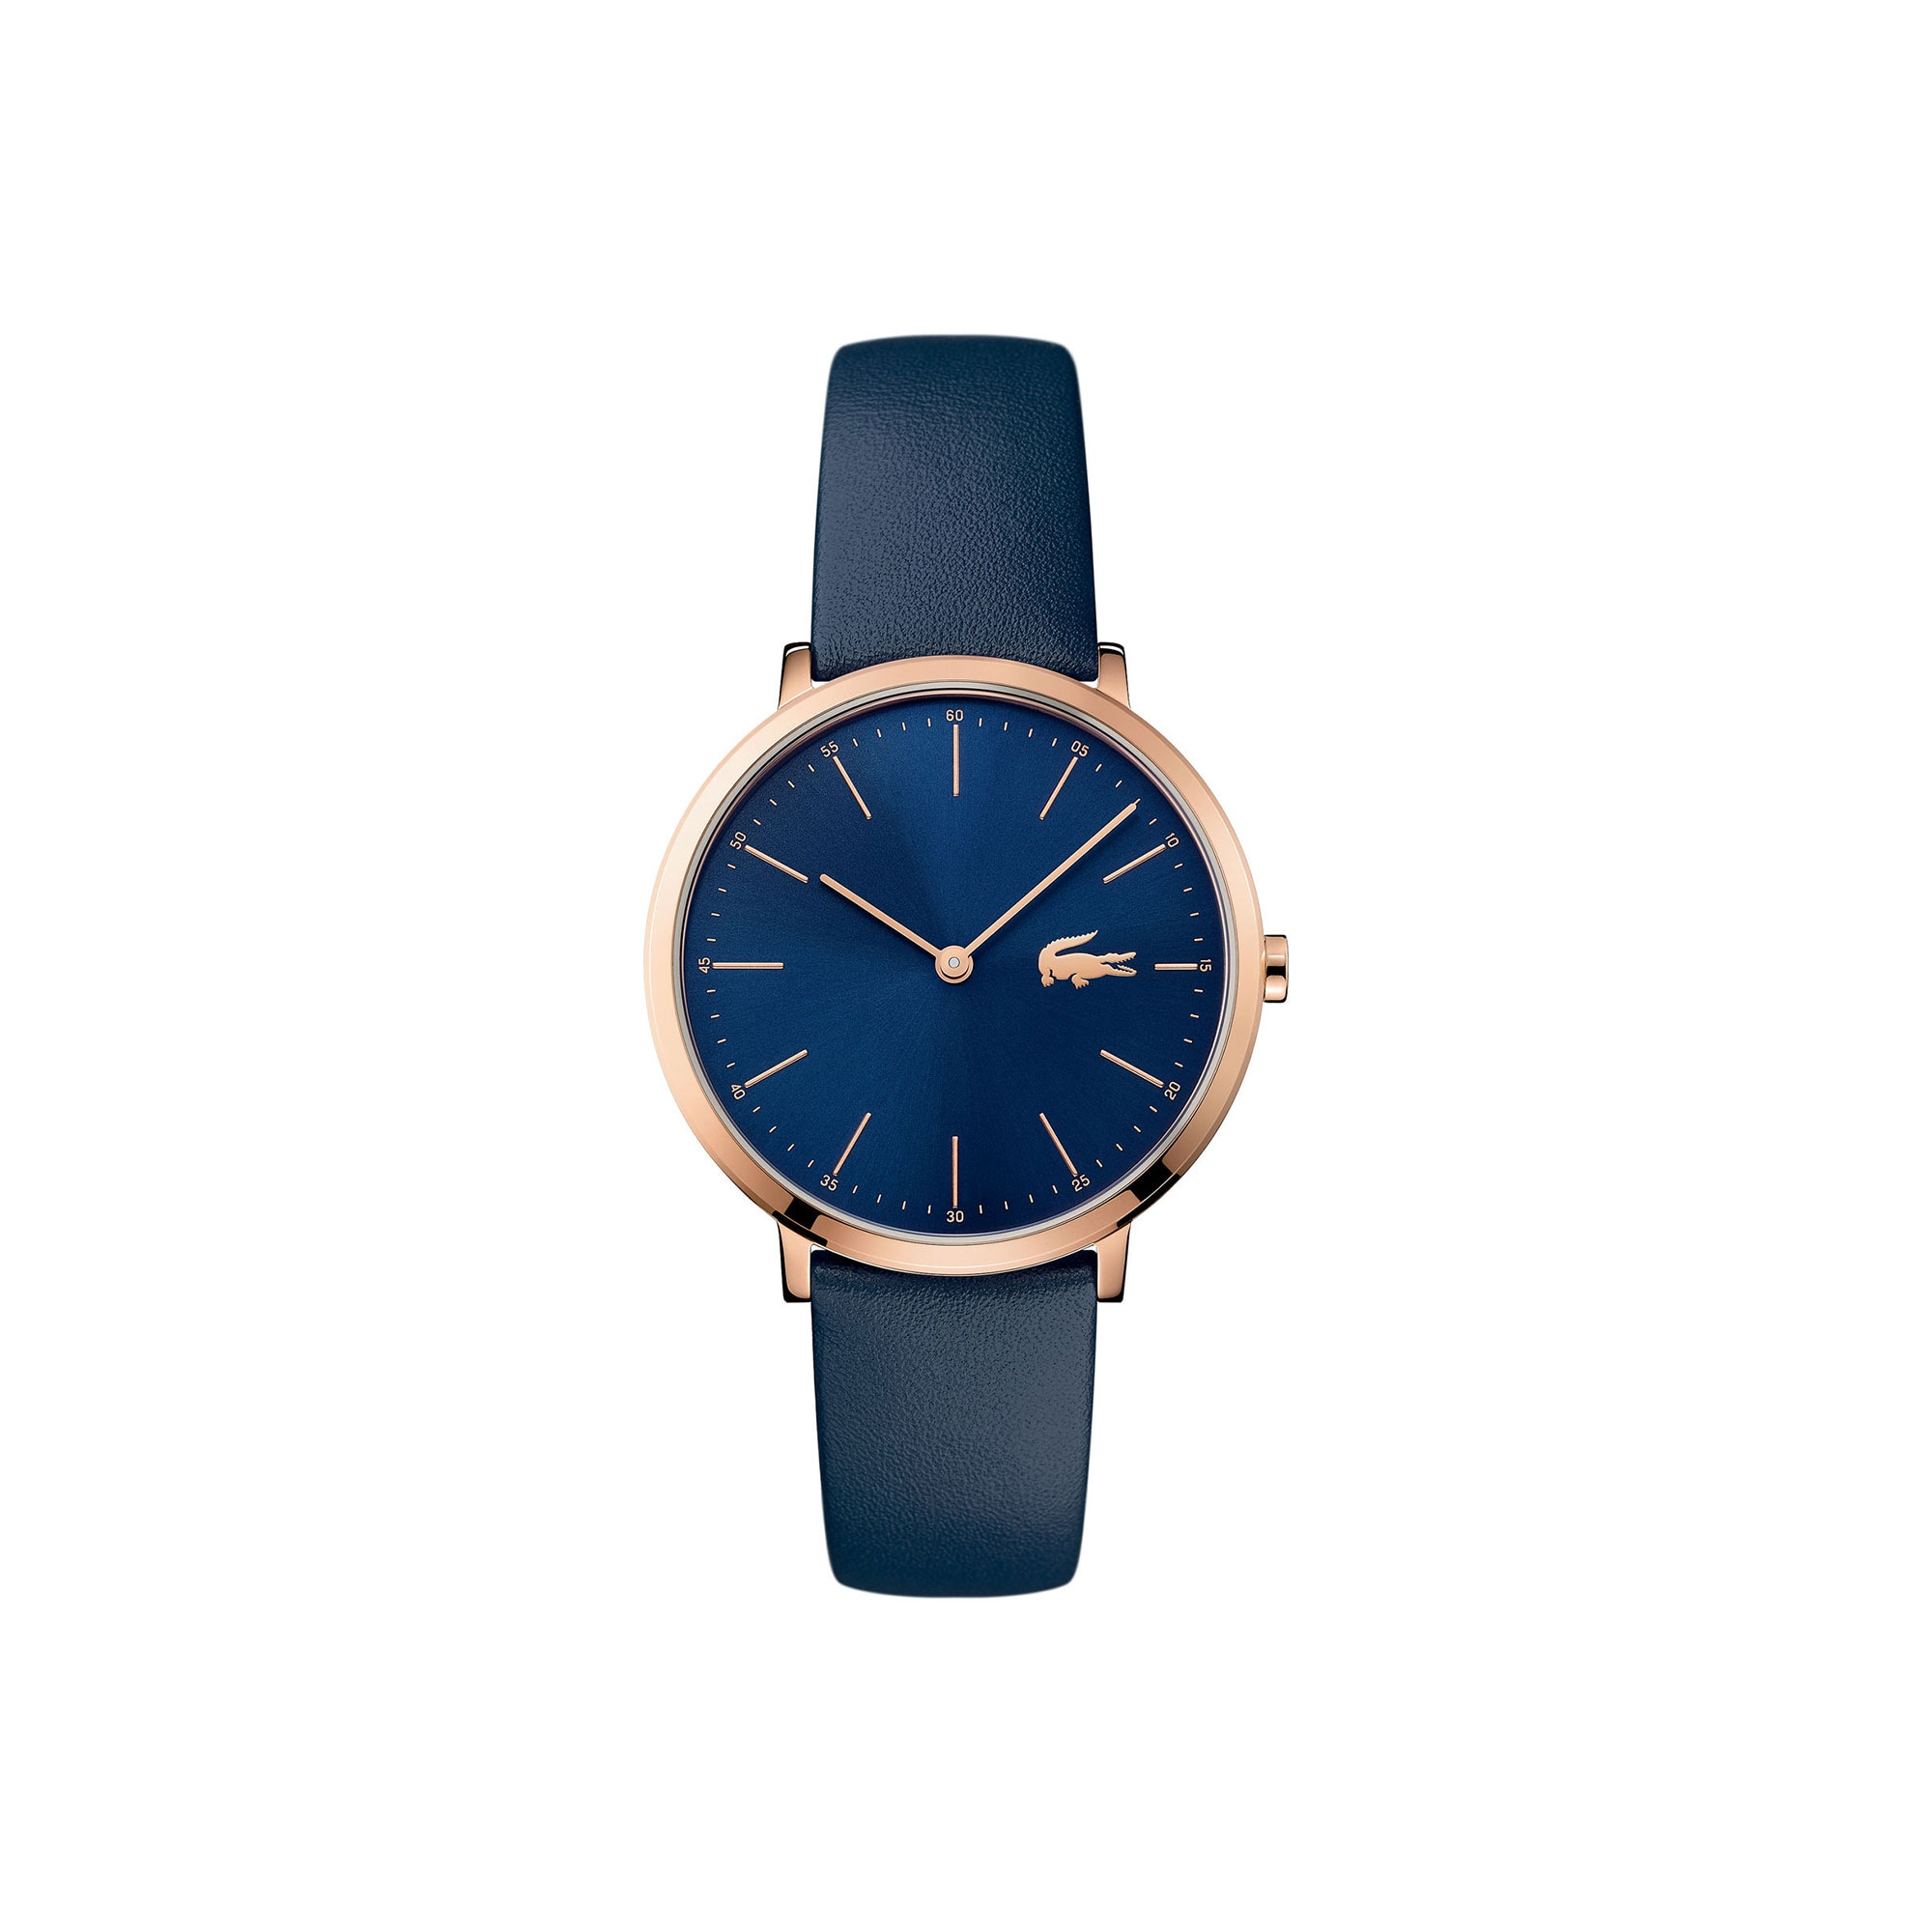 Montre Moon Ultrafine Femme avec Bracelet Bleu en Cuir